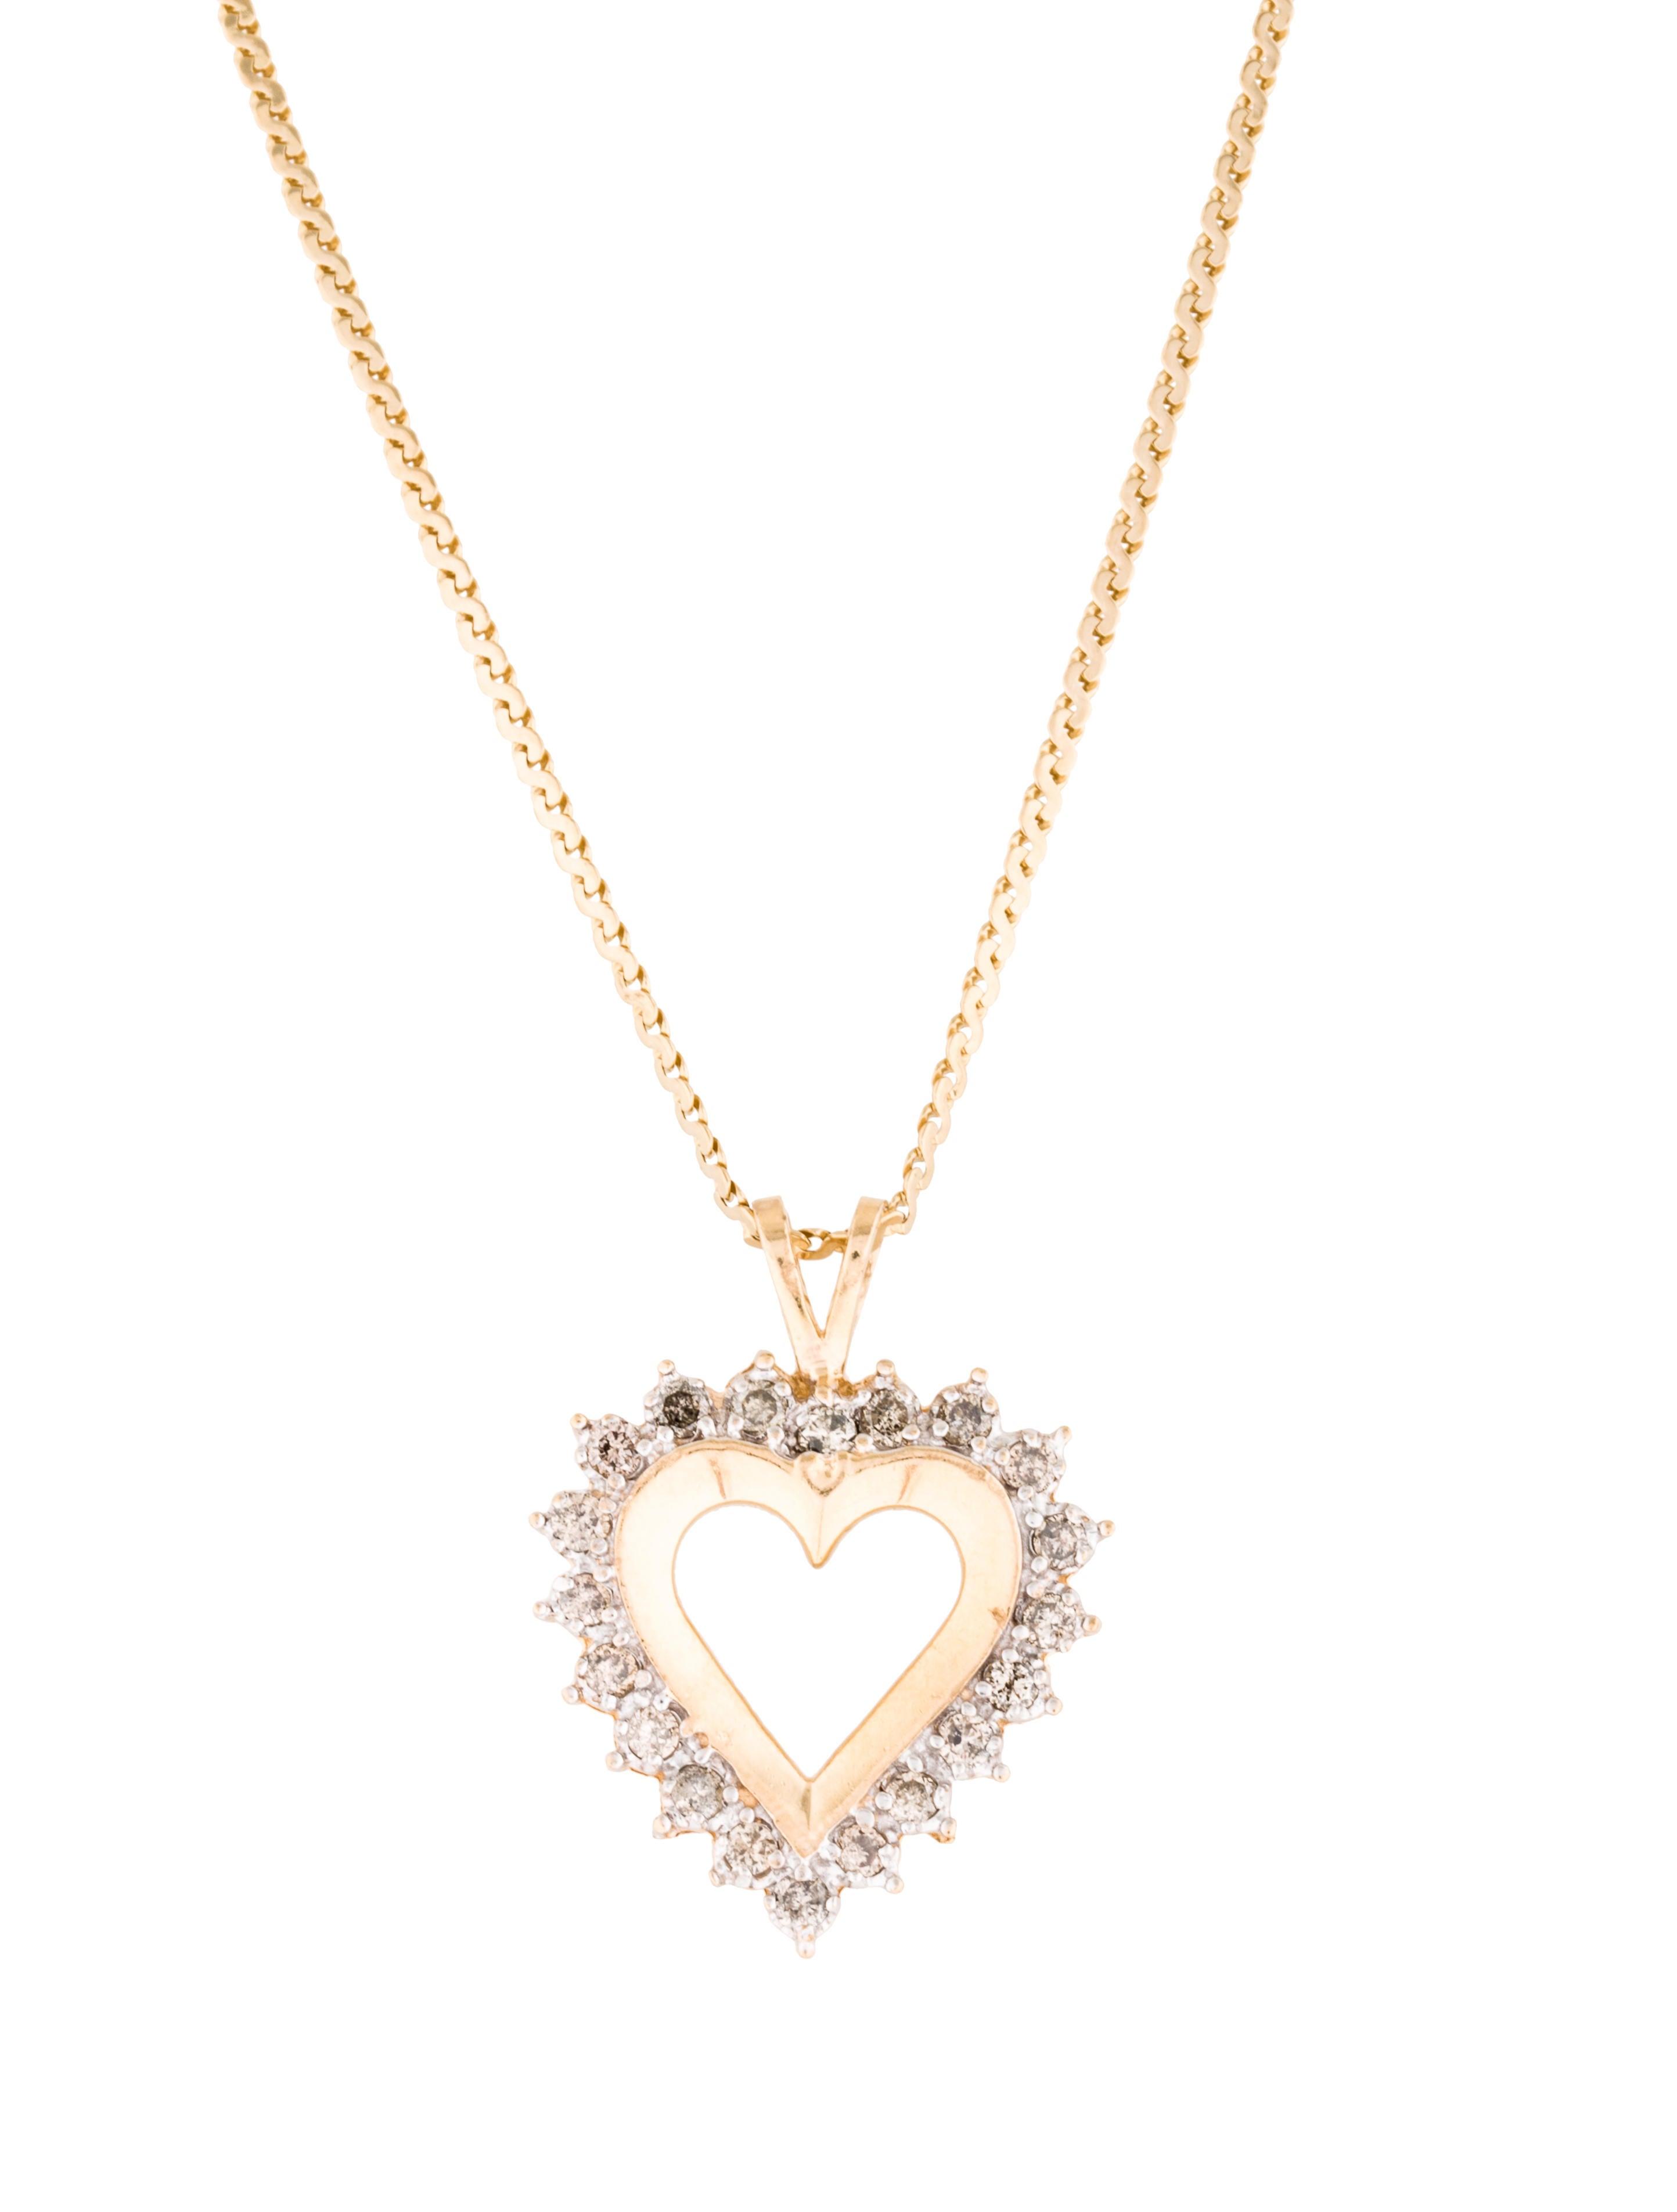 how to buy a diamond pendant